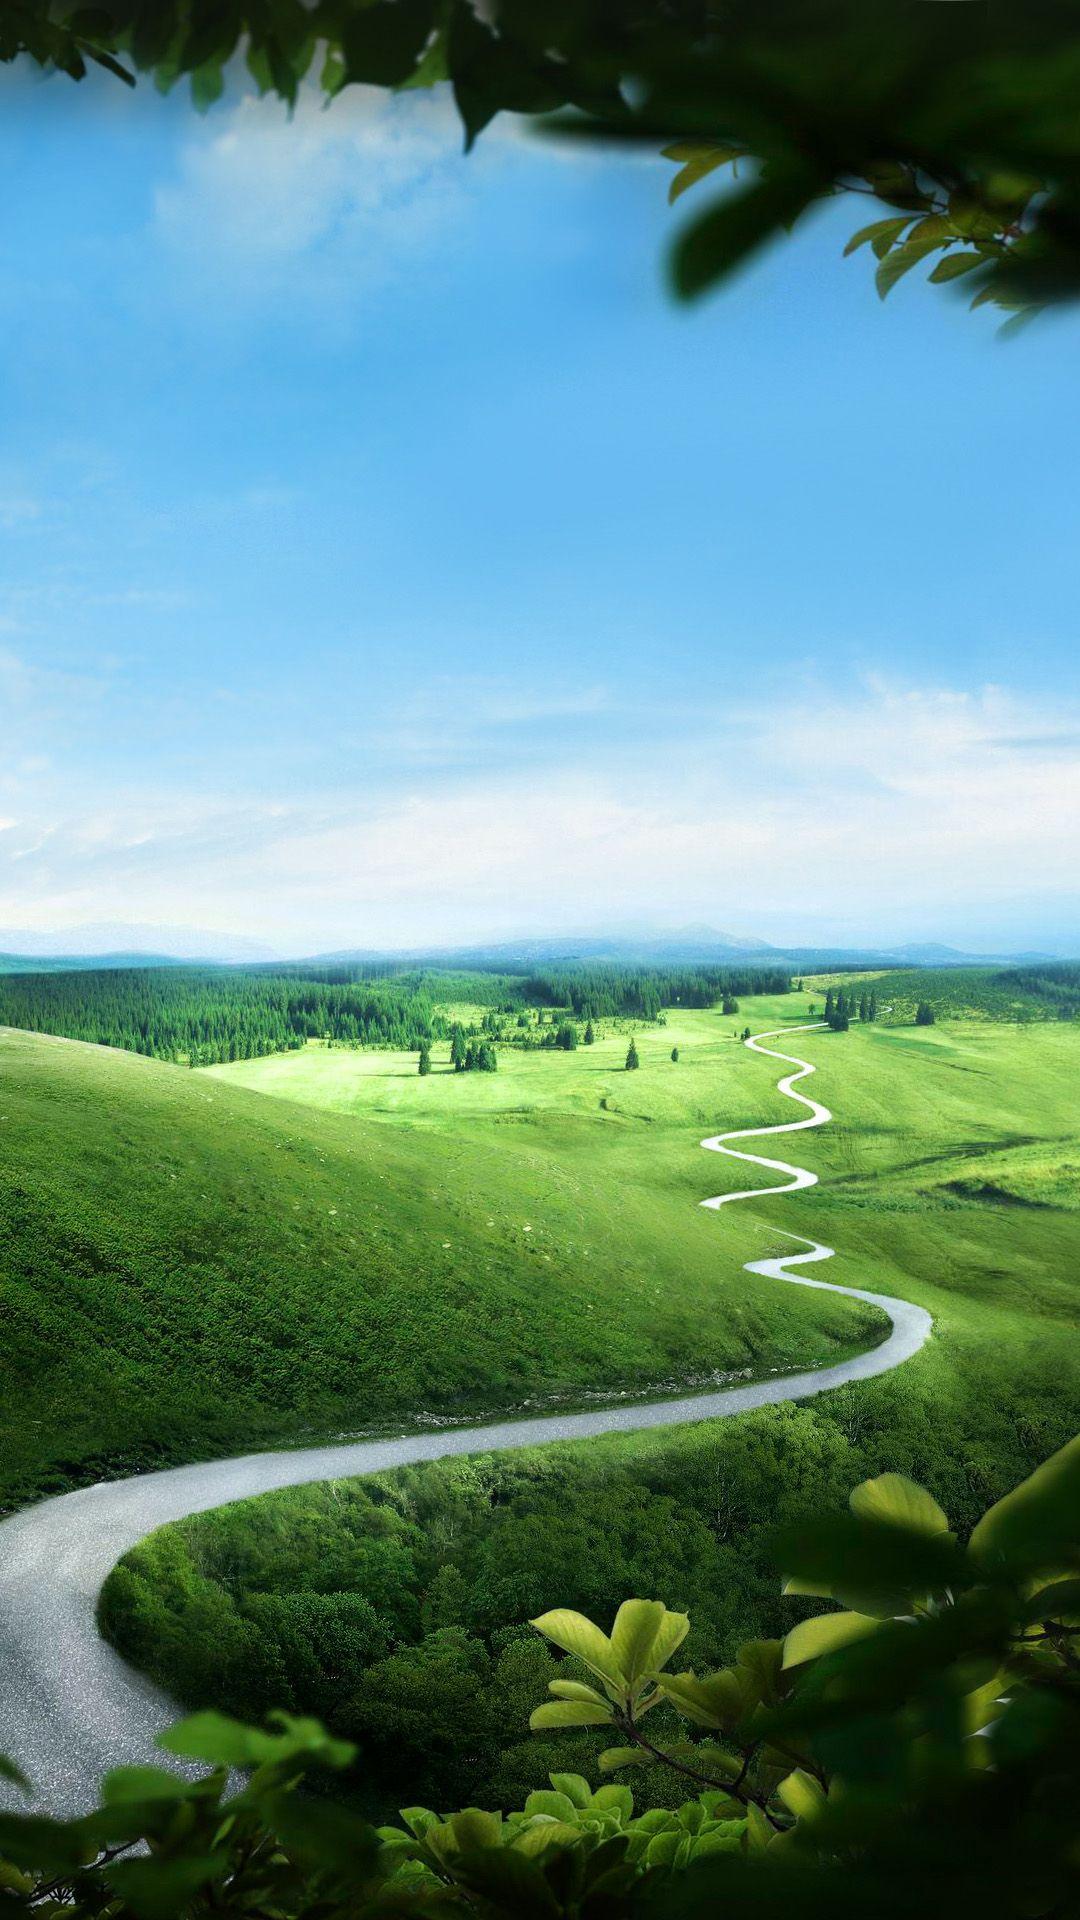 1080x1920 Hd nature wallpapers, Landscape wallpaper